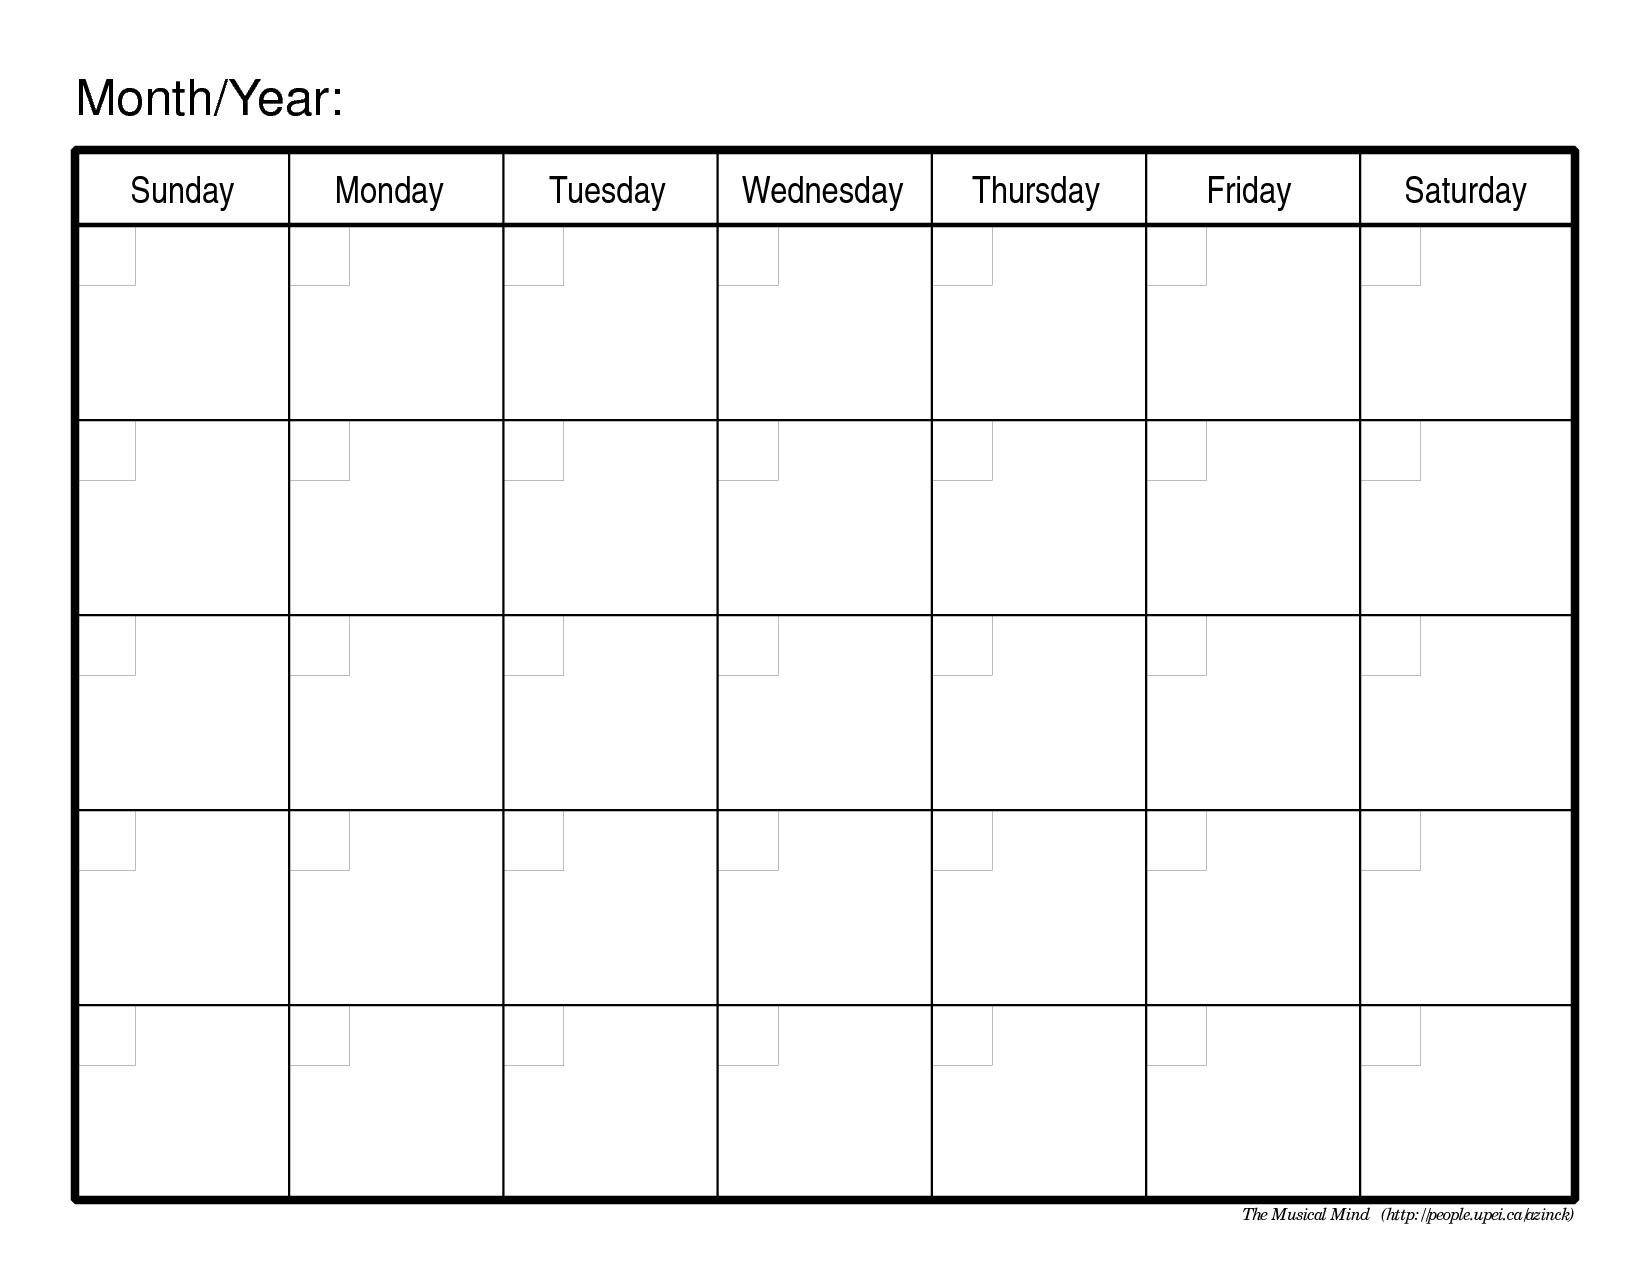 Monthly Calendar Printable Free - Yeder.berglauf-Verband_Blank Calendar Months To Print